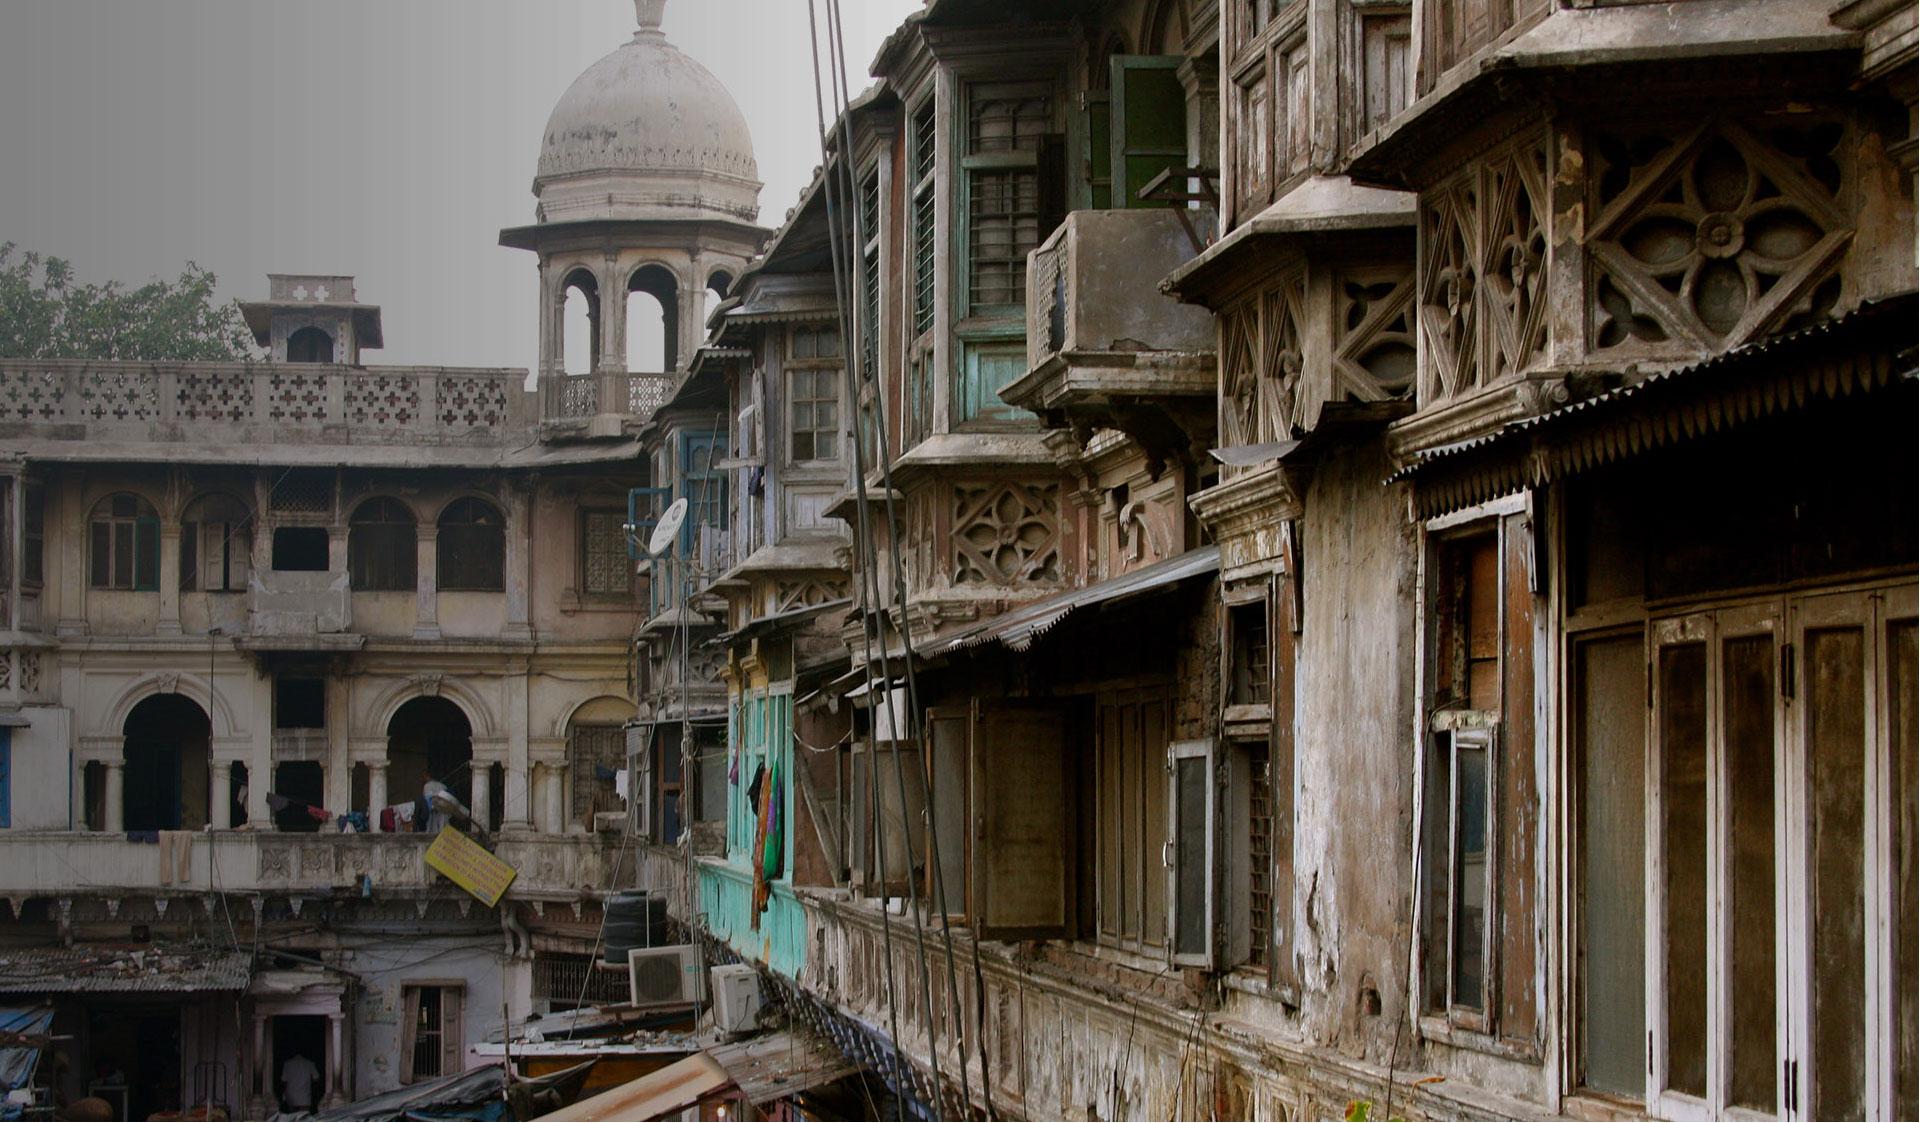 Delhi Agra Tours From Mumbai